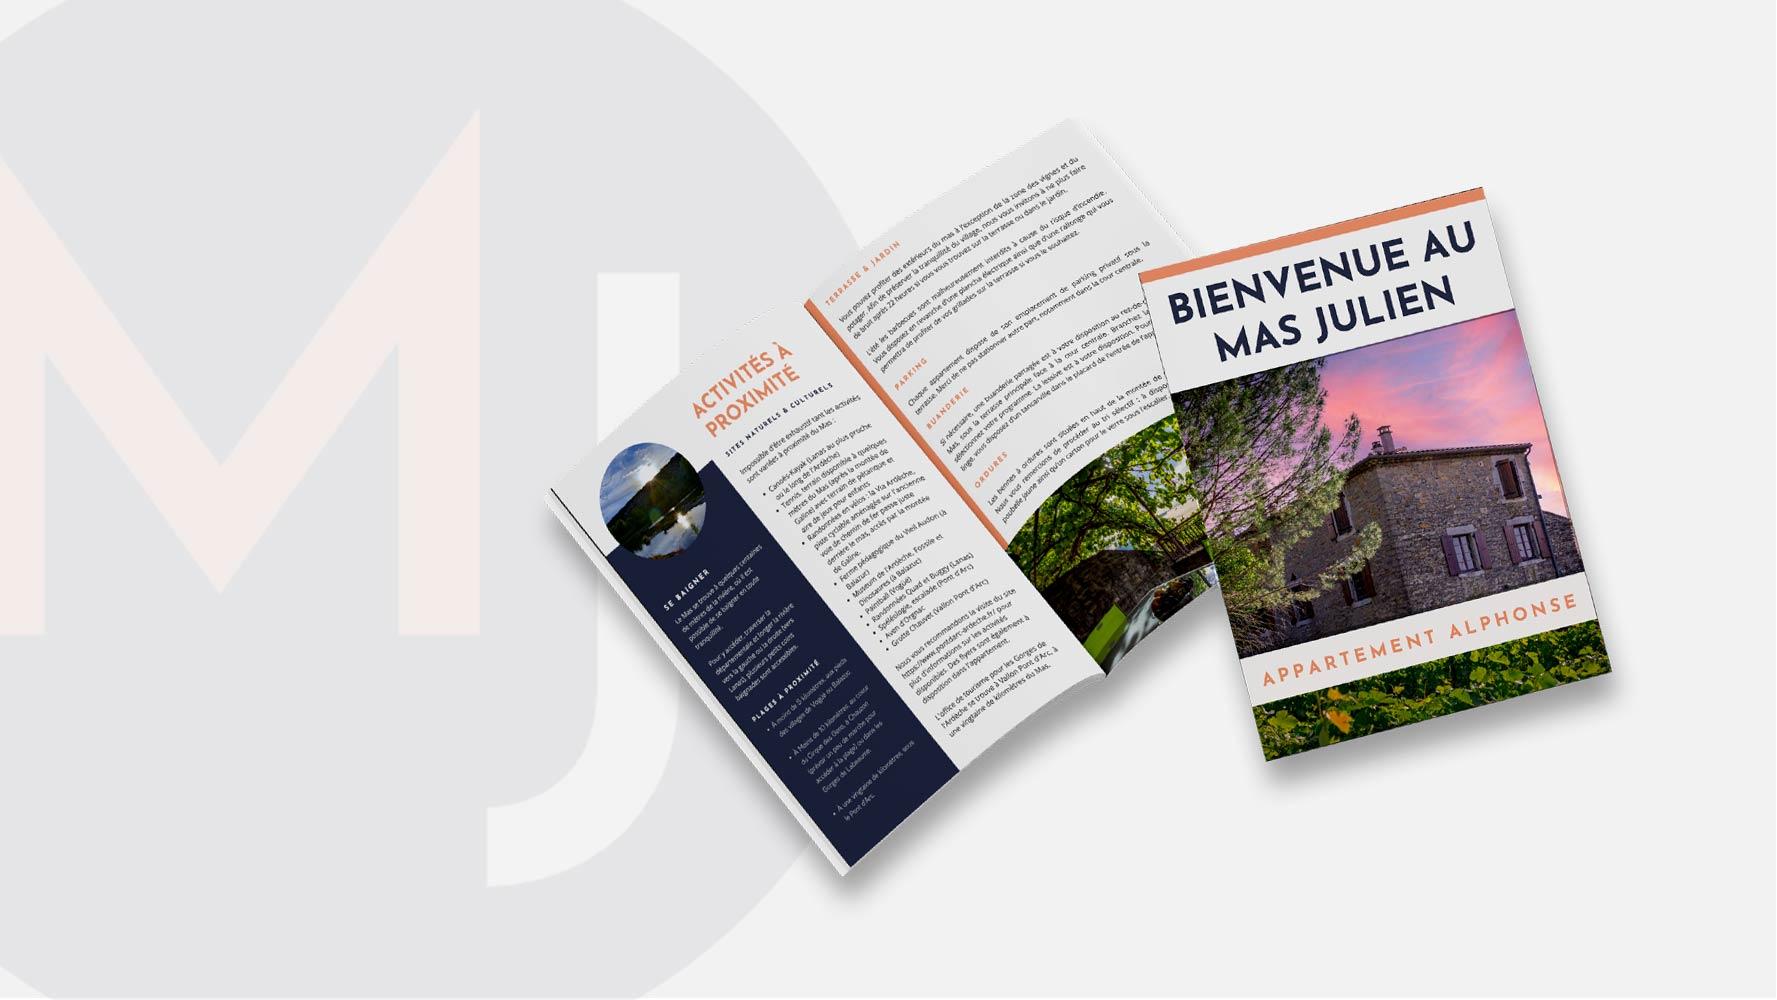 Brochure Mas Julien par JLF Agency